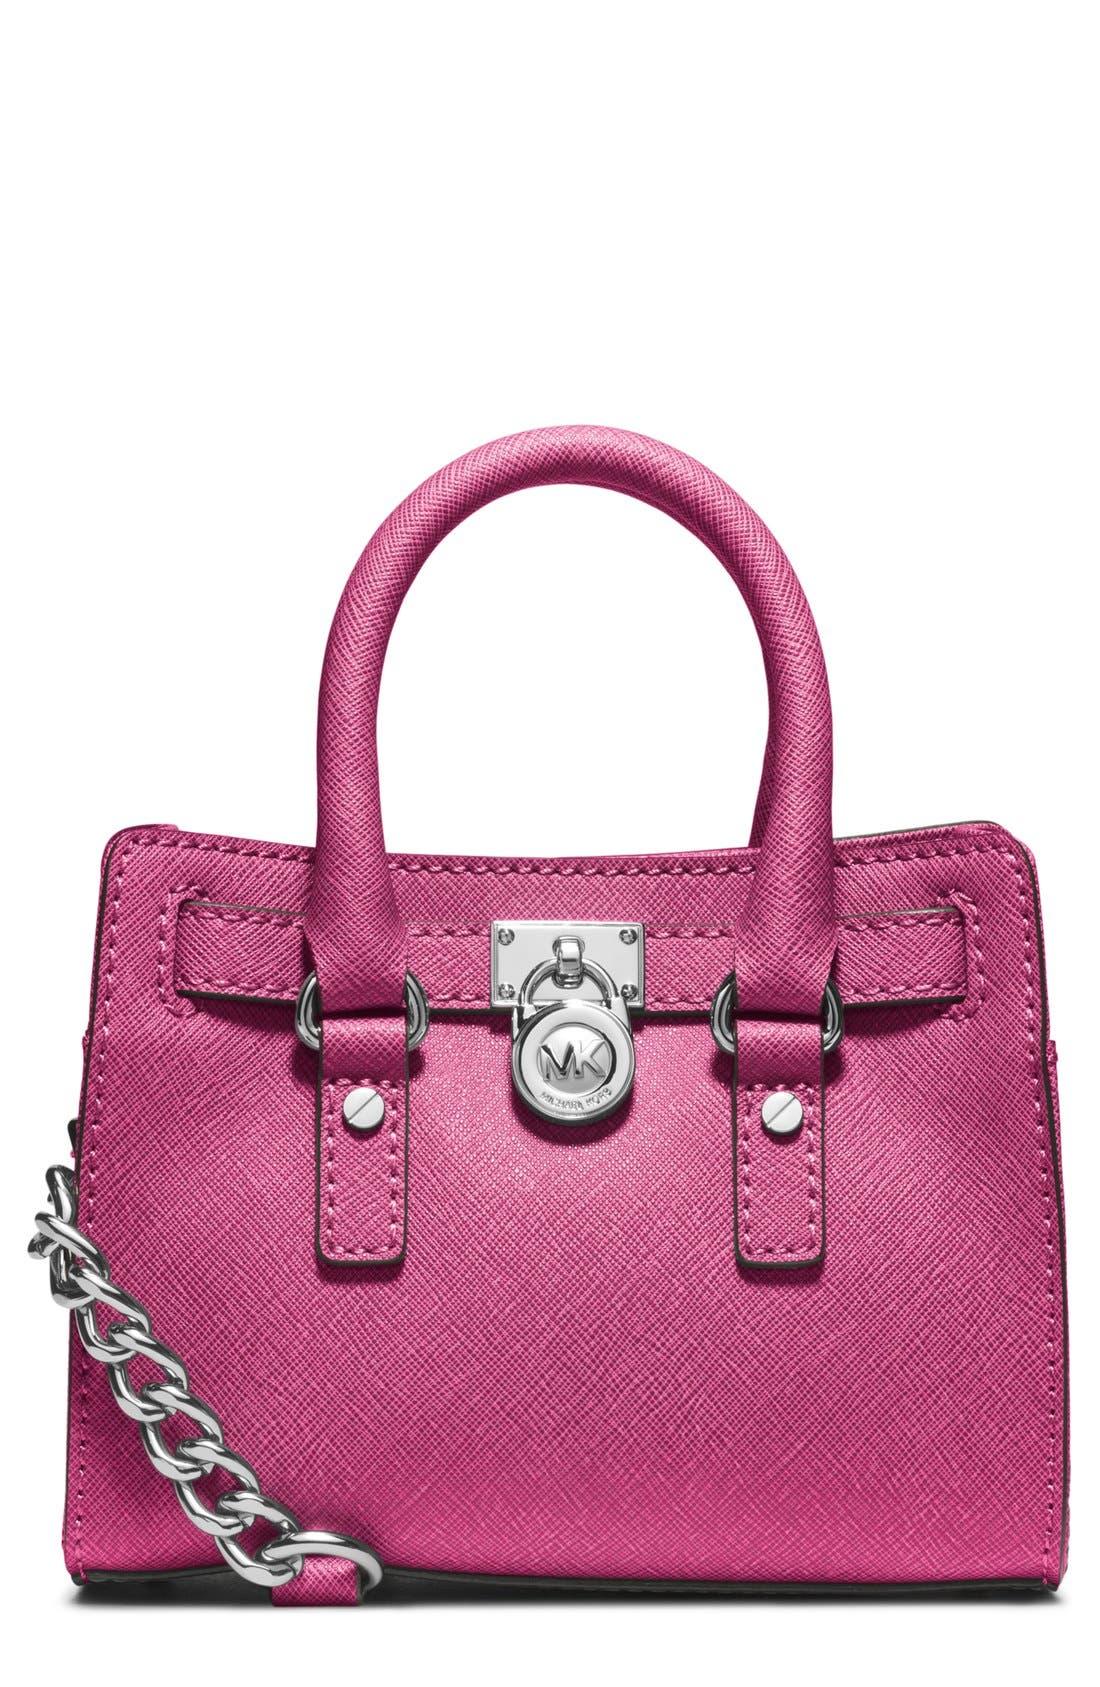 Alternate Image 1 Selected - MICHAEL Michael Kors 'Mini Hamilton' Leather Messenger Bag